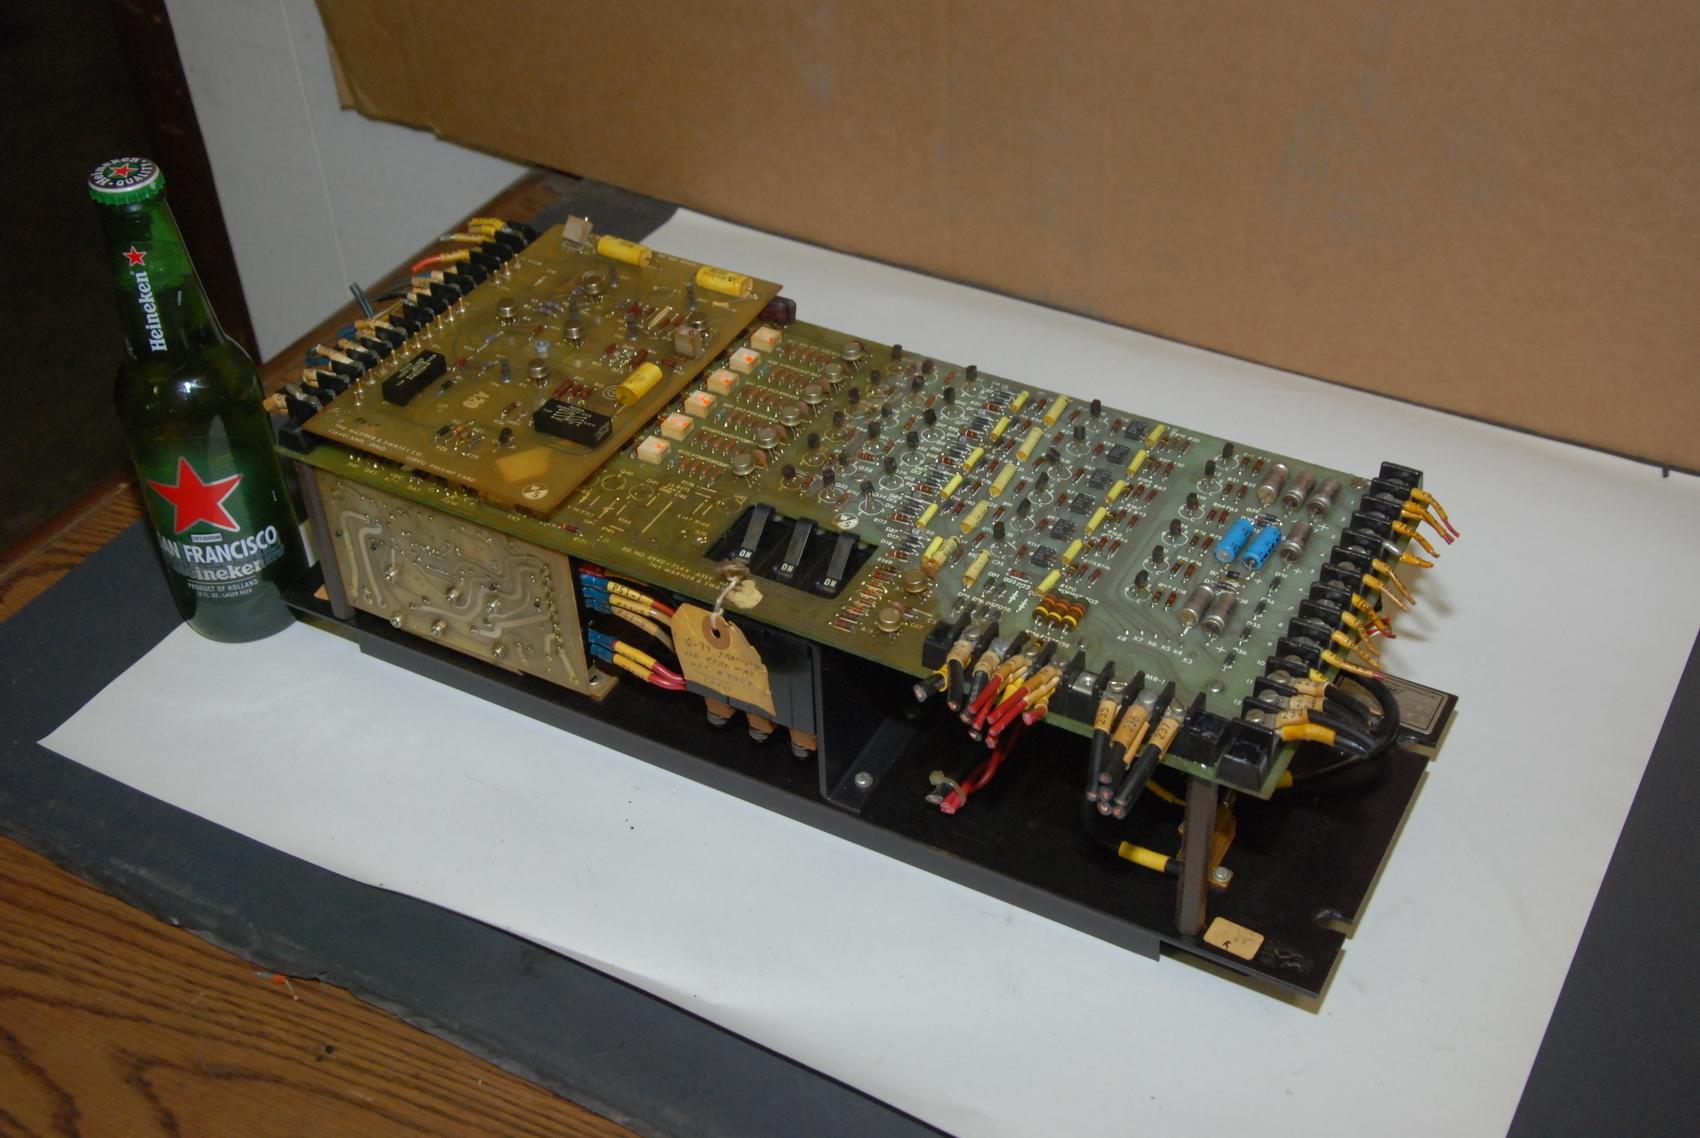 Warner and Swasey 5351 servo Drive;Top board 8940-754K